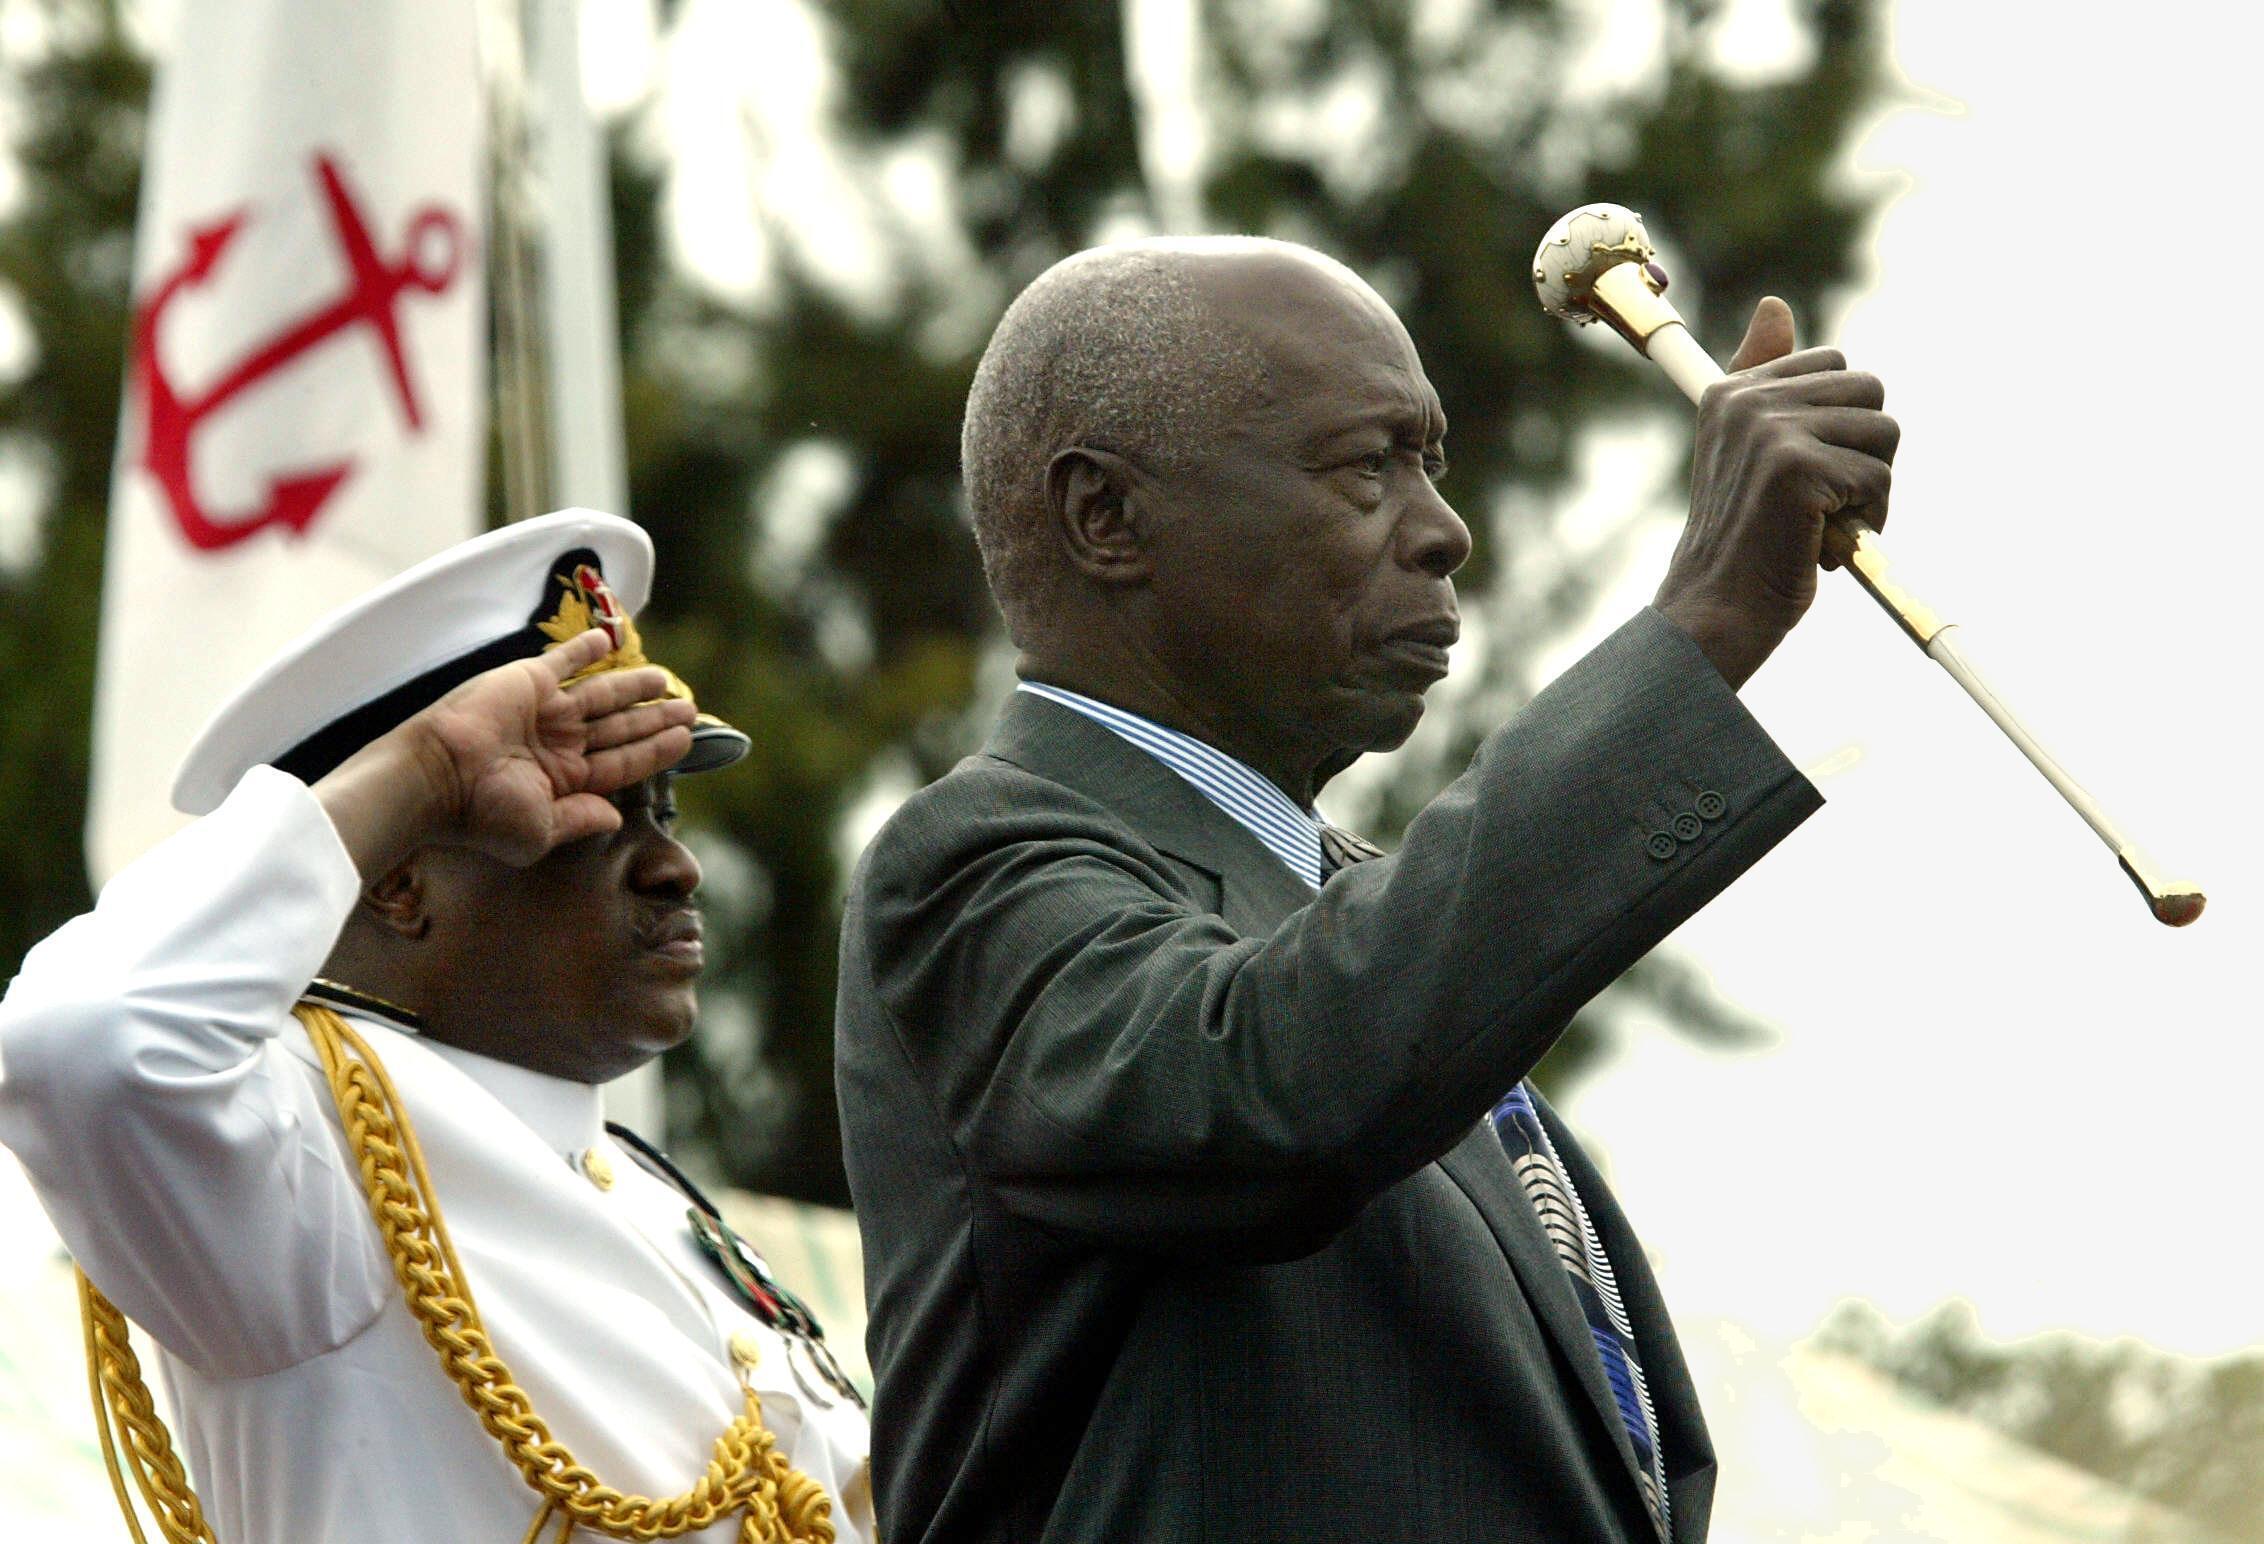 Daniel Arap Moi, former president of Kenya, shortly before his departure from power in 2002.